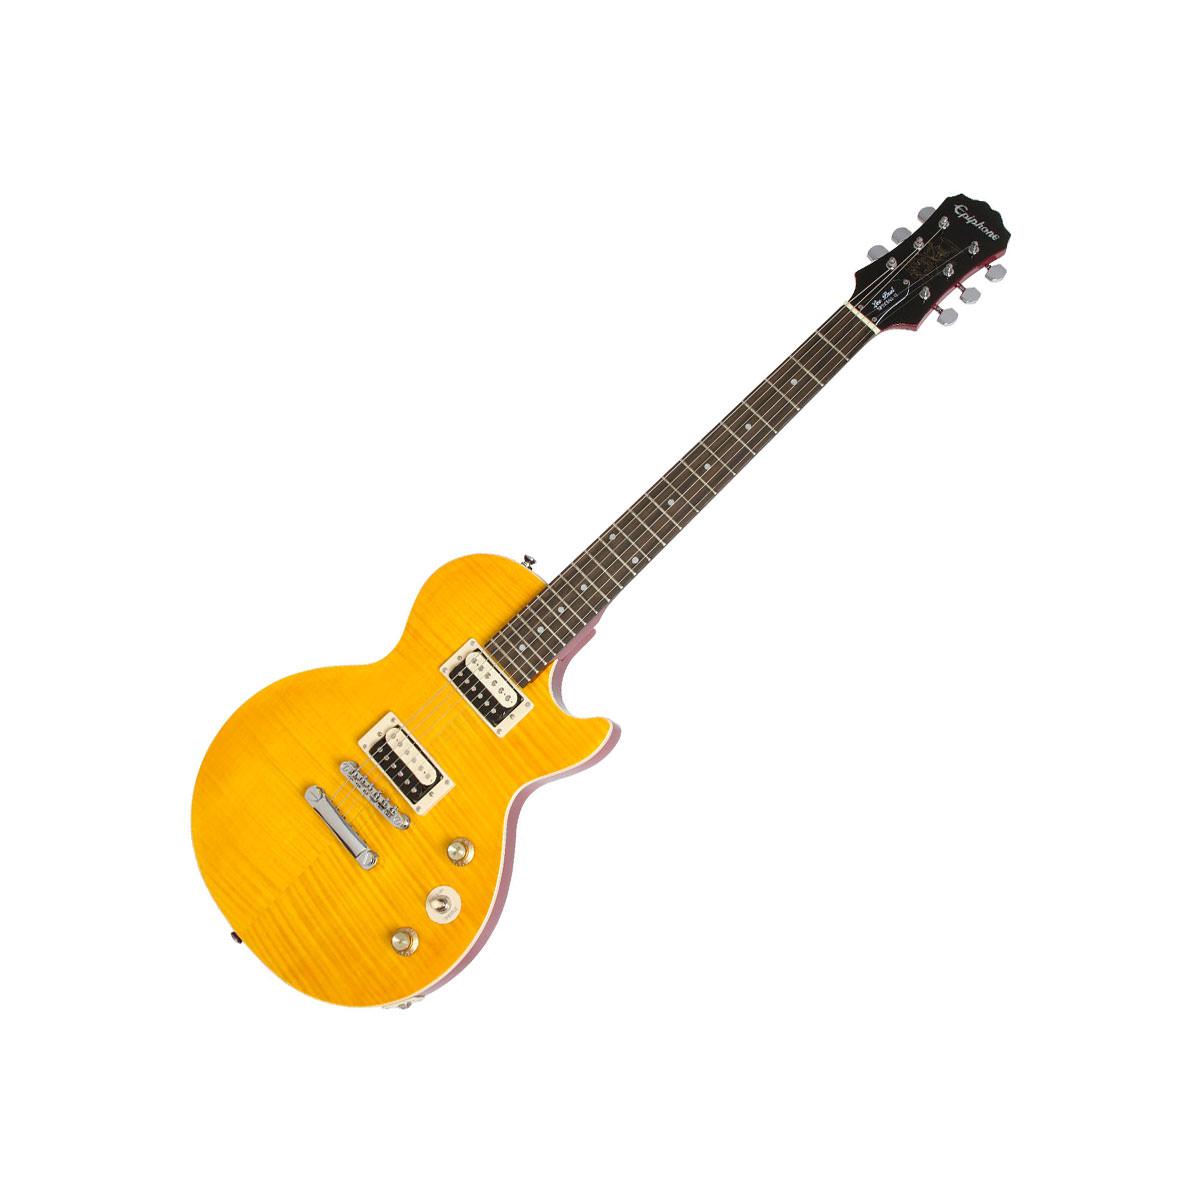 "Epiphone ""Slash"" AFD Les Paul Special II Guitar Outfit"